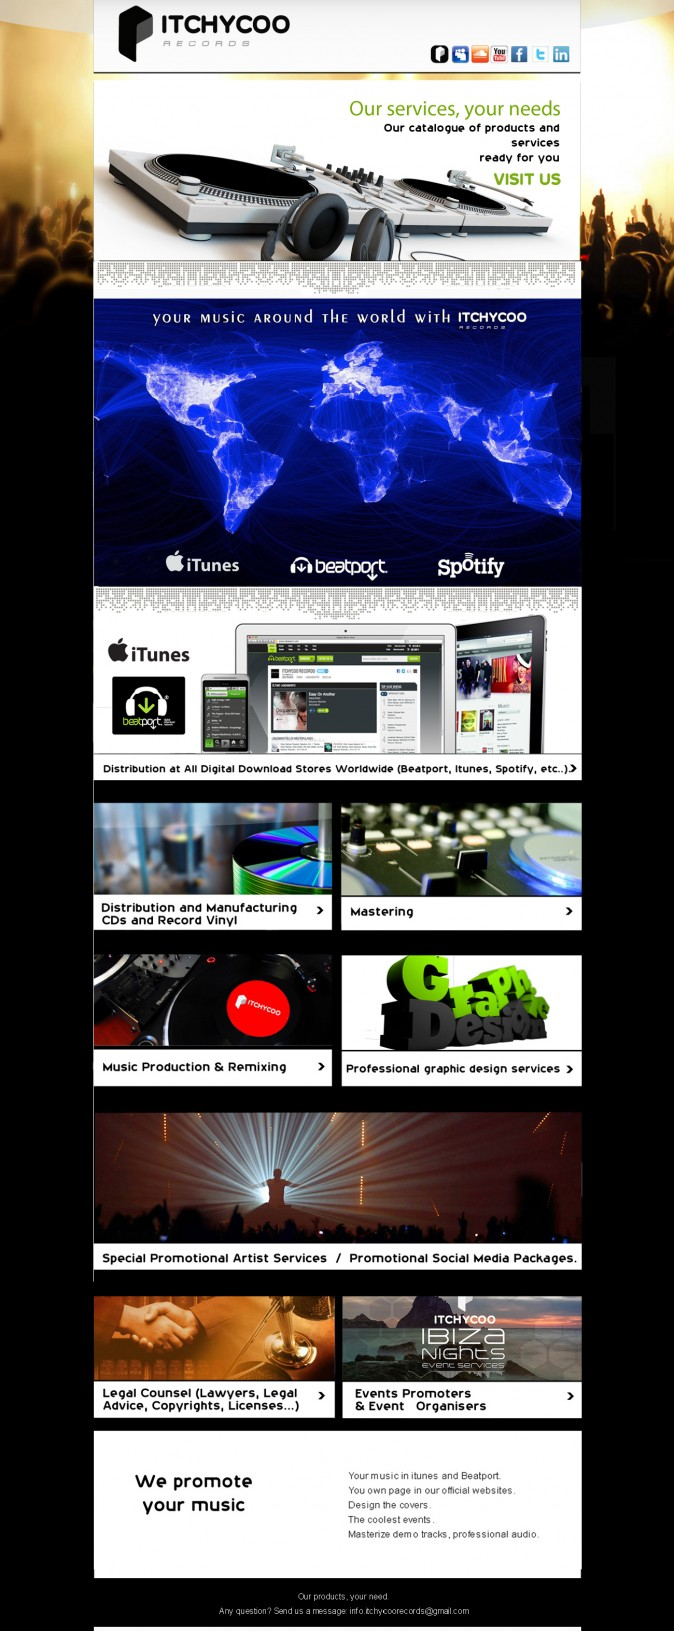 newsletter dj products october copia copia